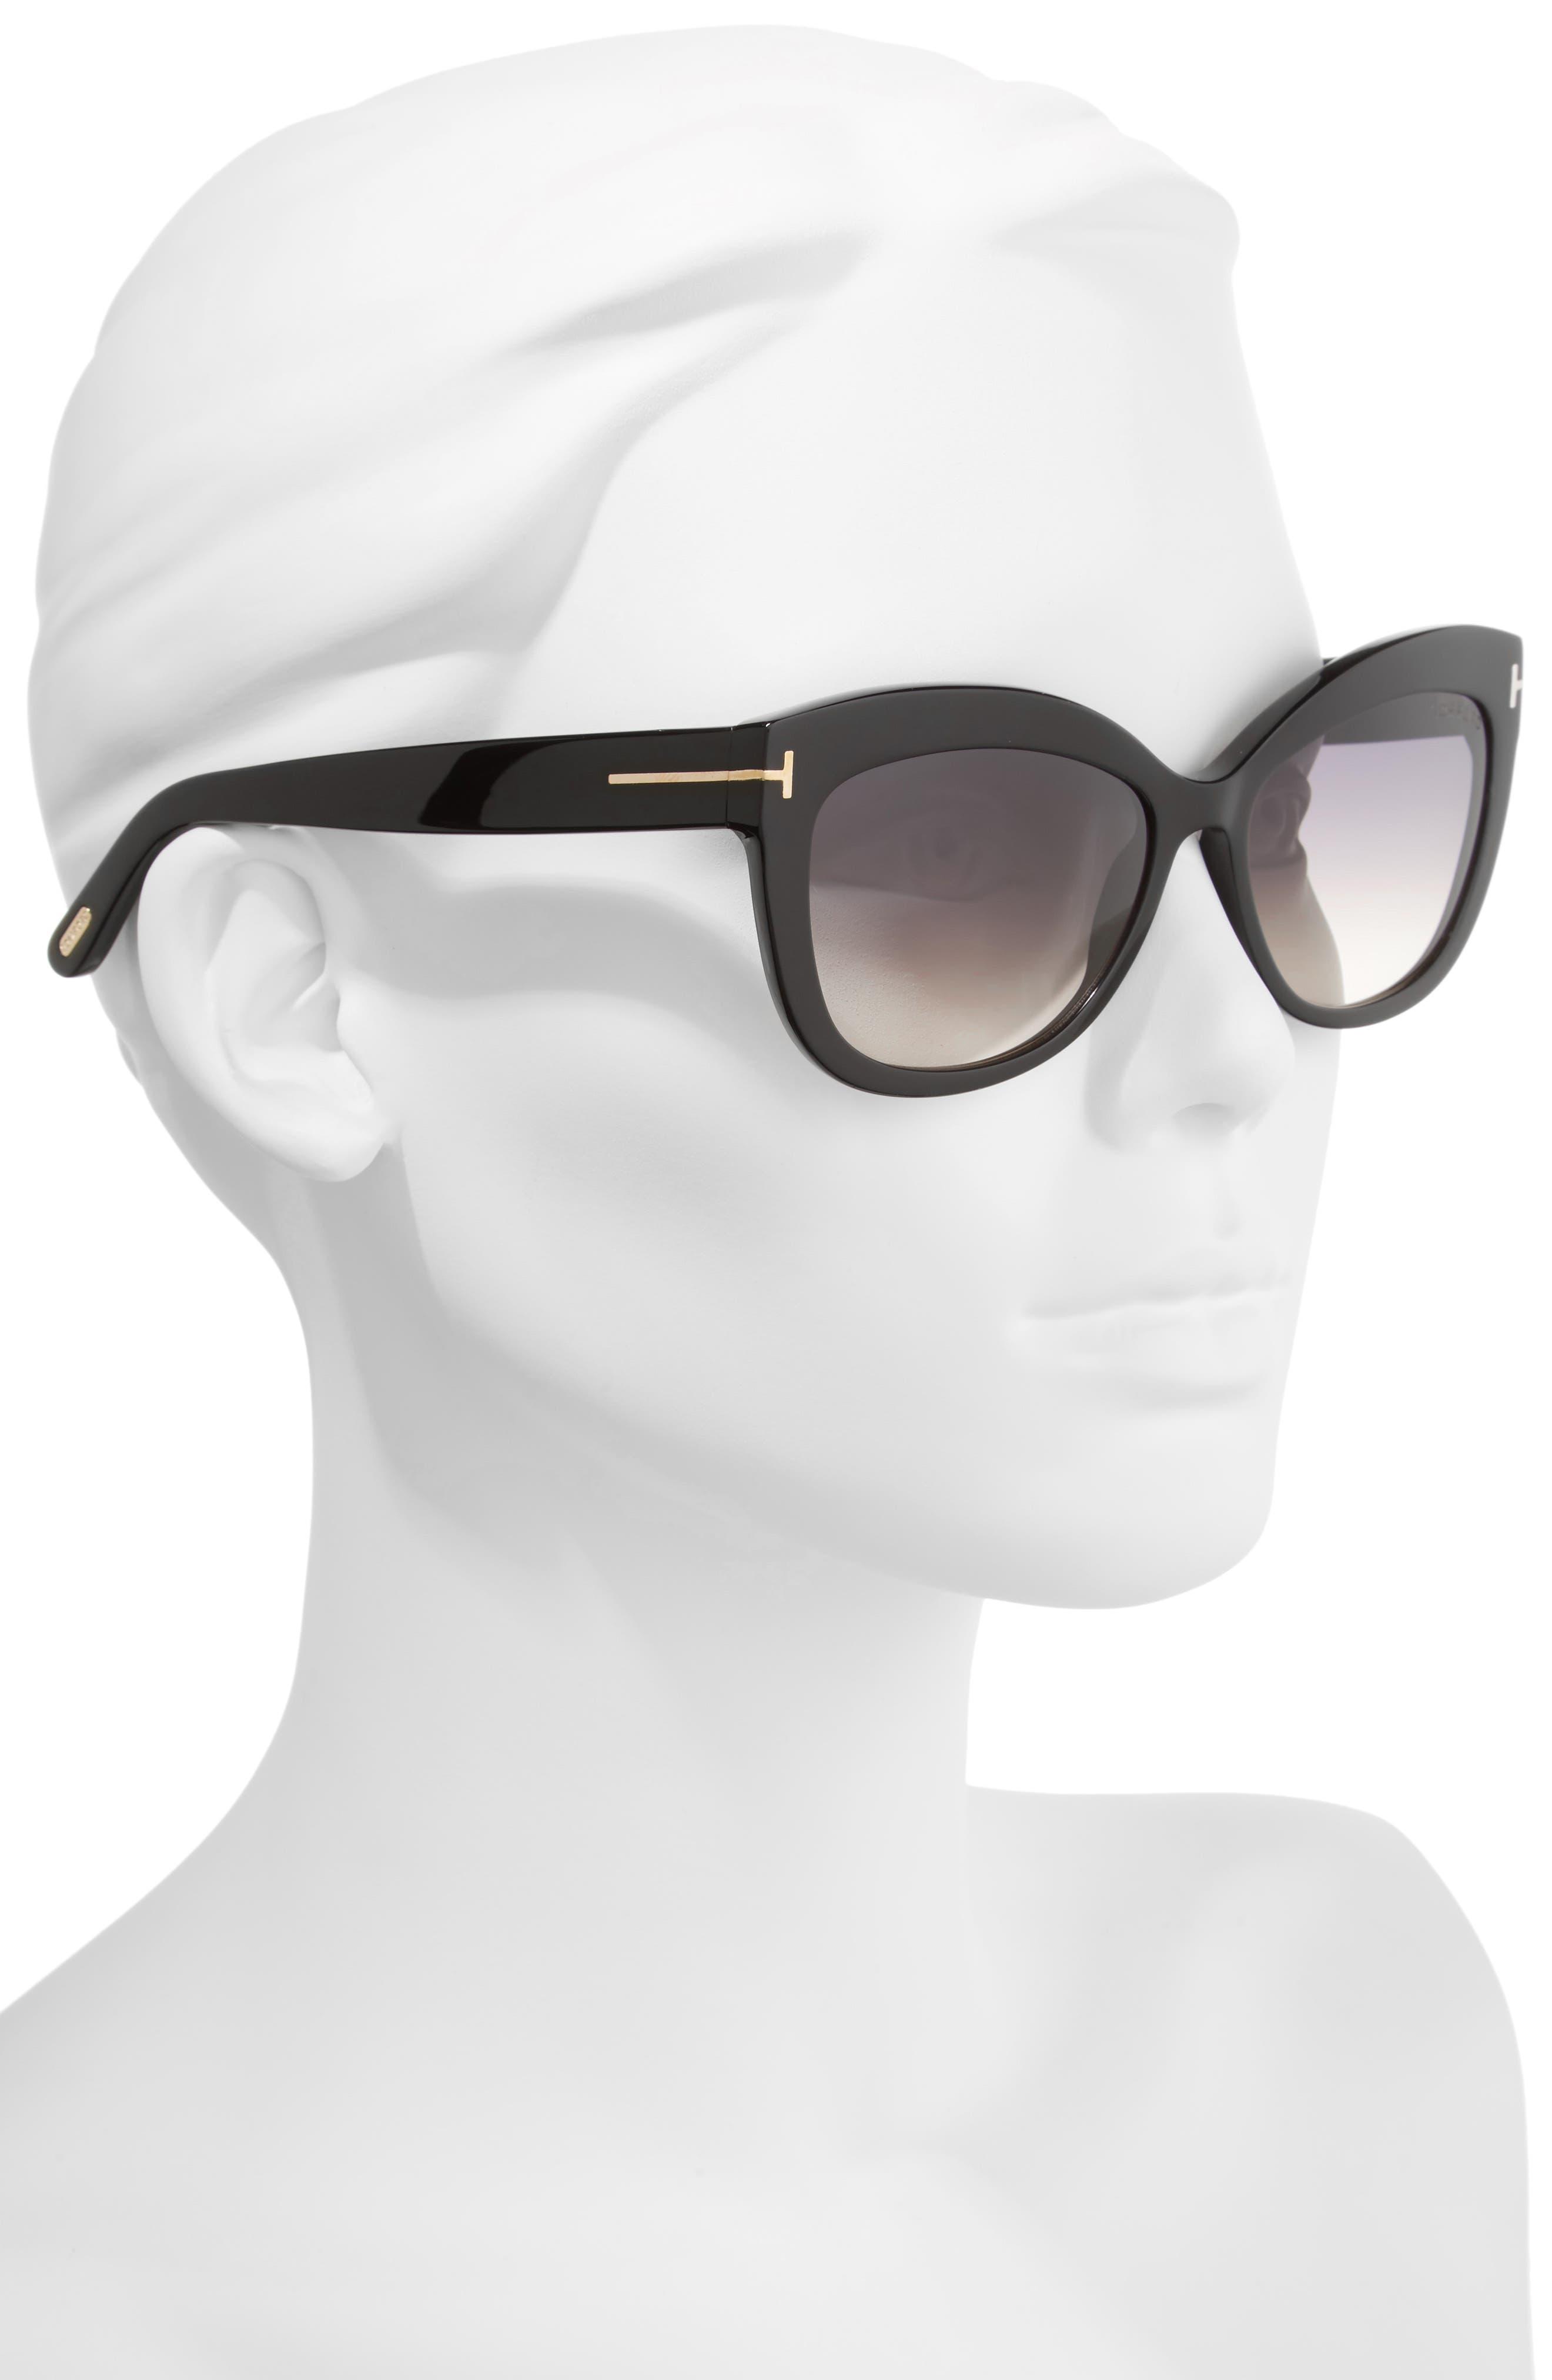 Alistair 56mm Gradient Sunglasses,                             Alternate thumbnail 2, color,                             SHINY BLACK / GRADIENT SMOKE